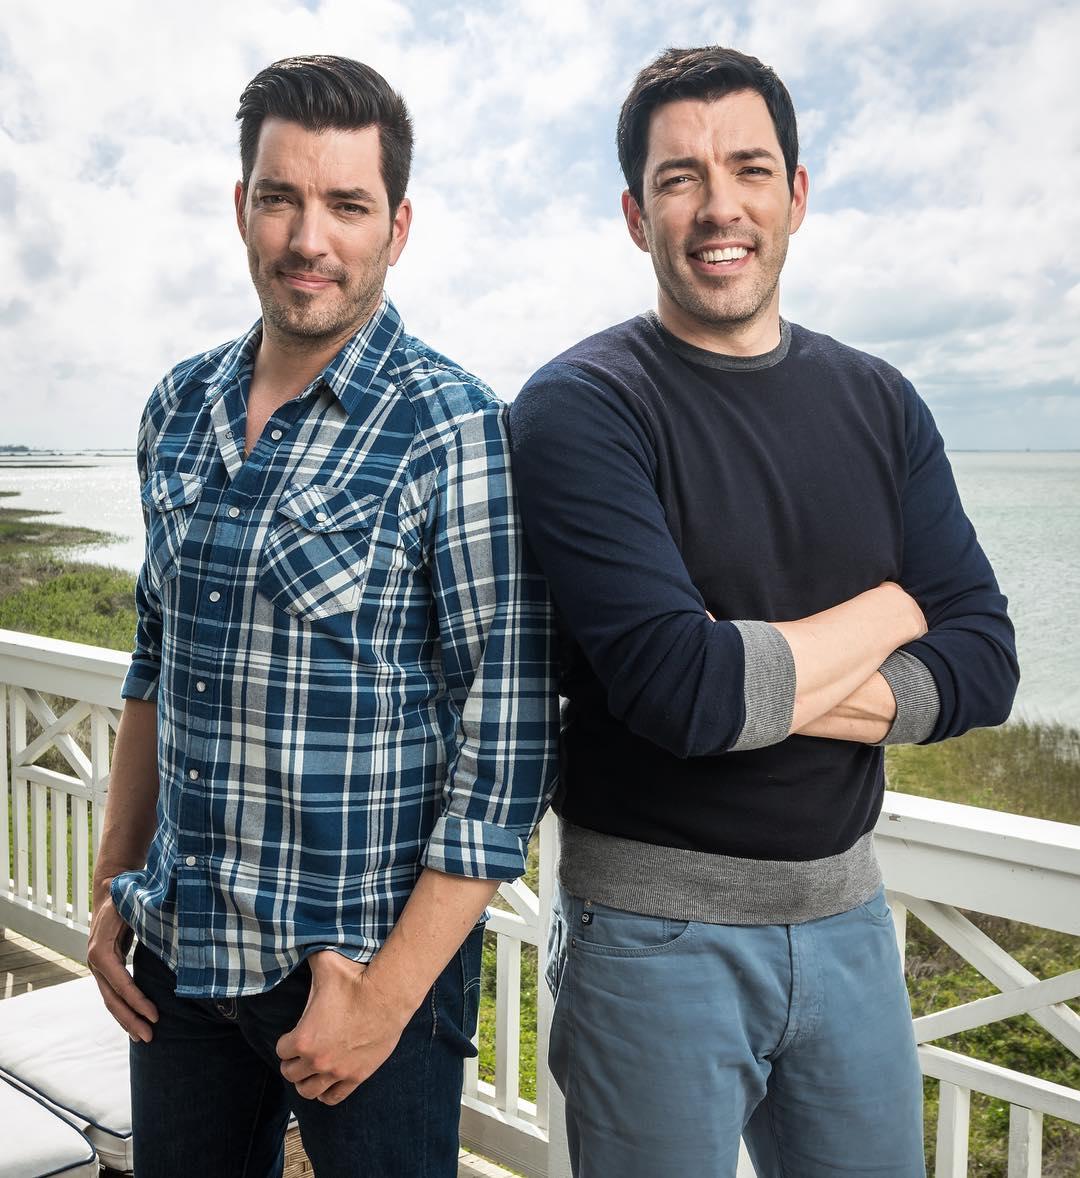 Property Brothers stars Jonathan Scott and Drew Scott